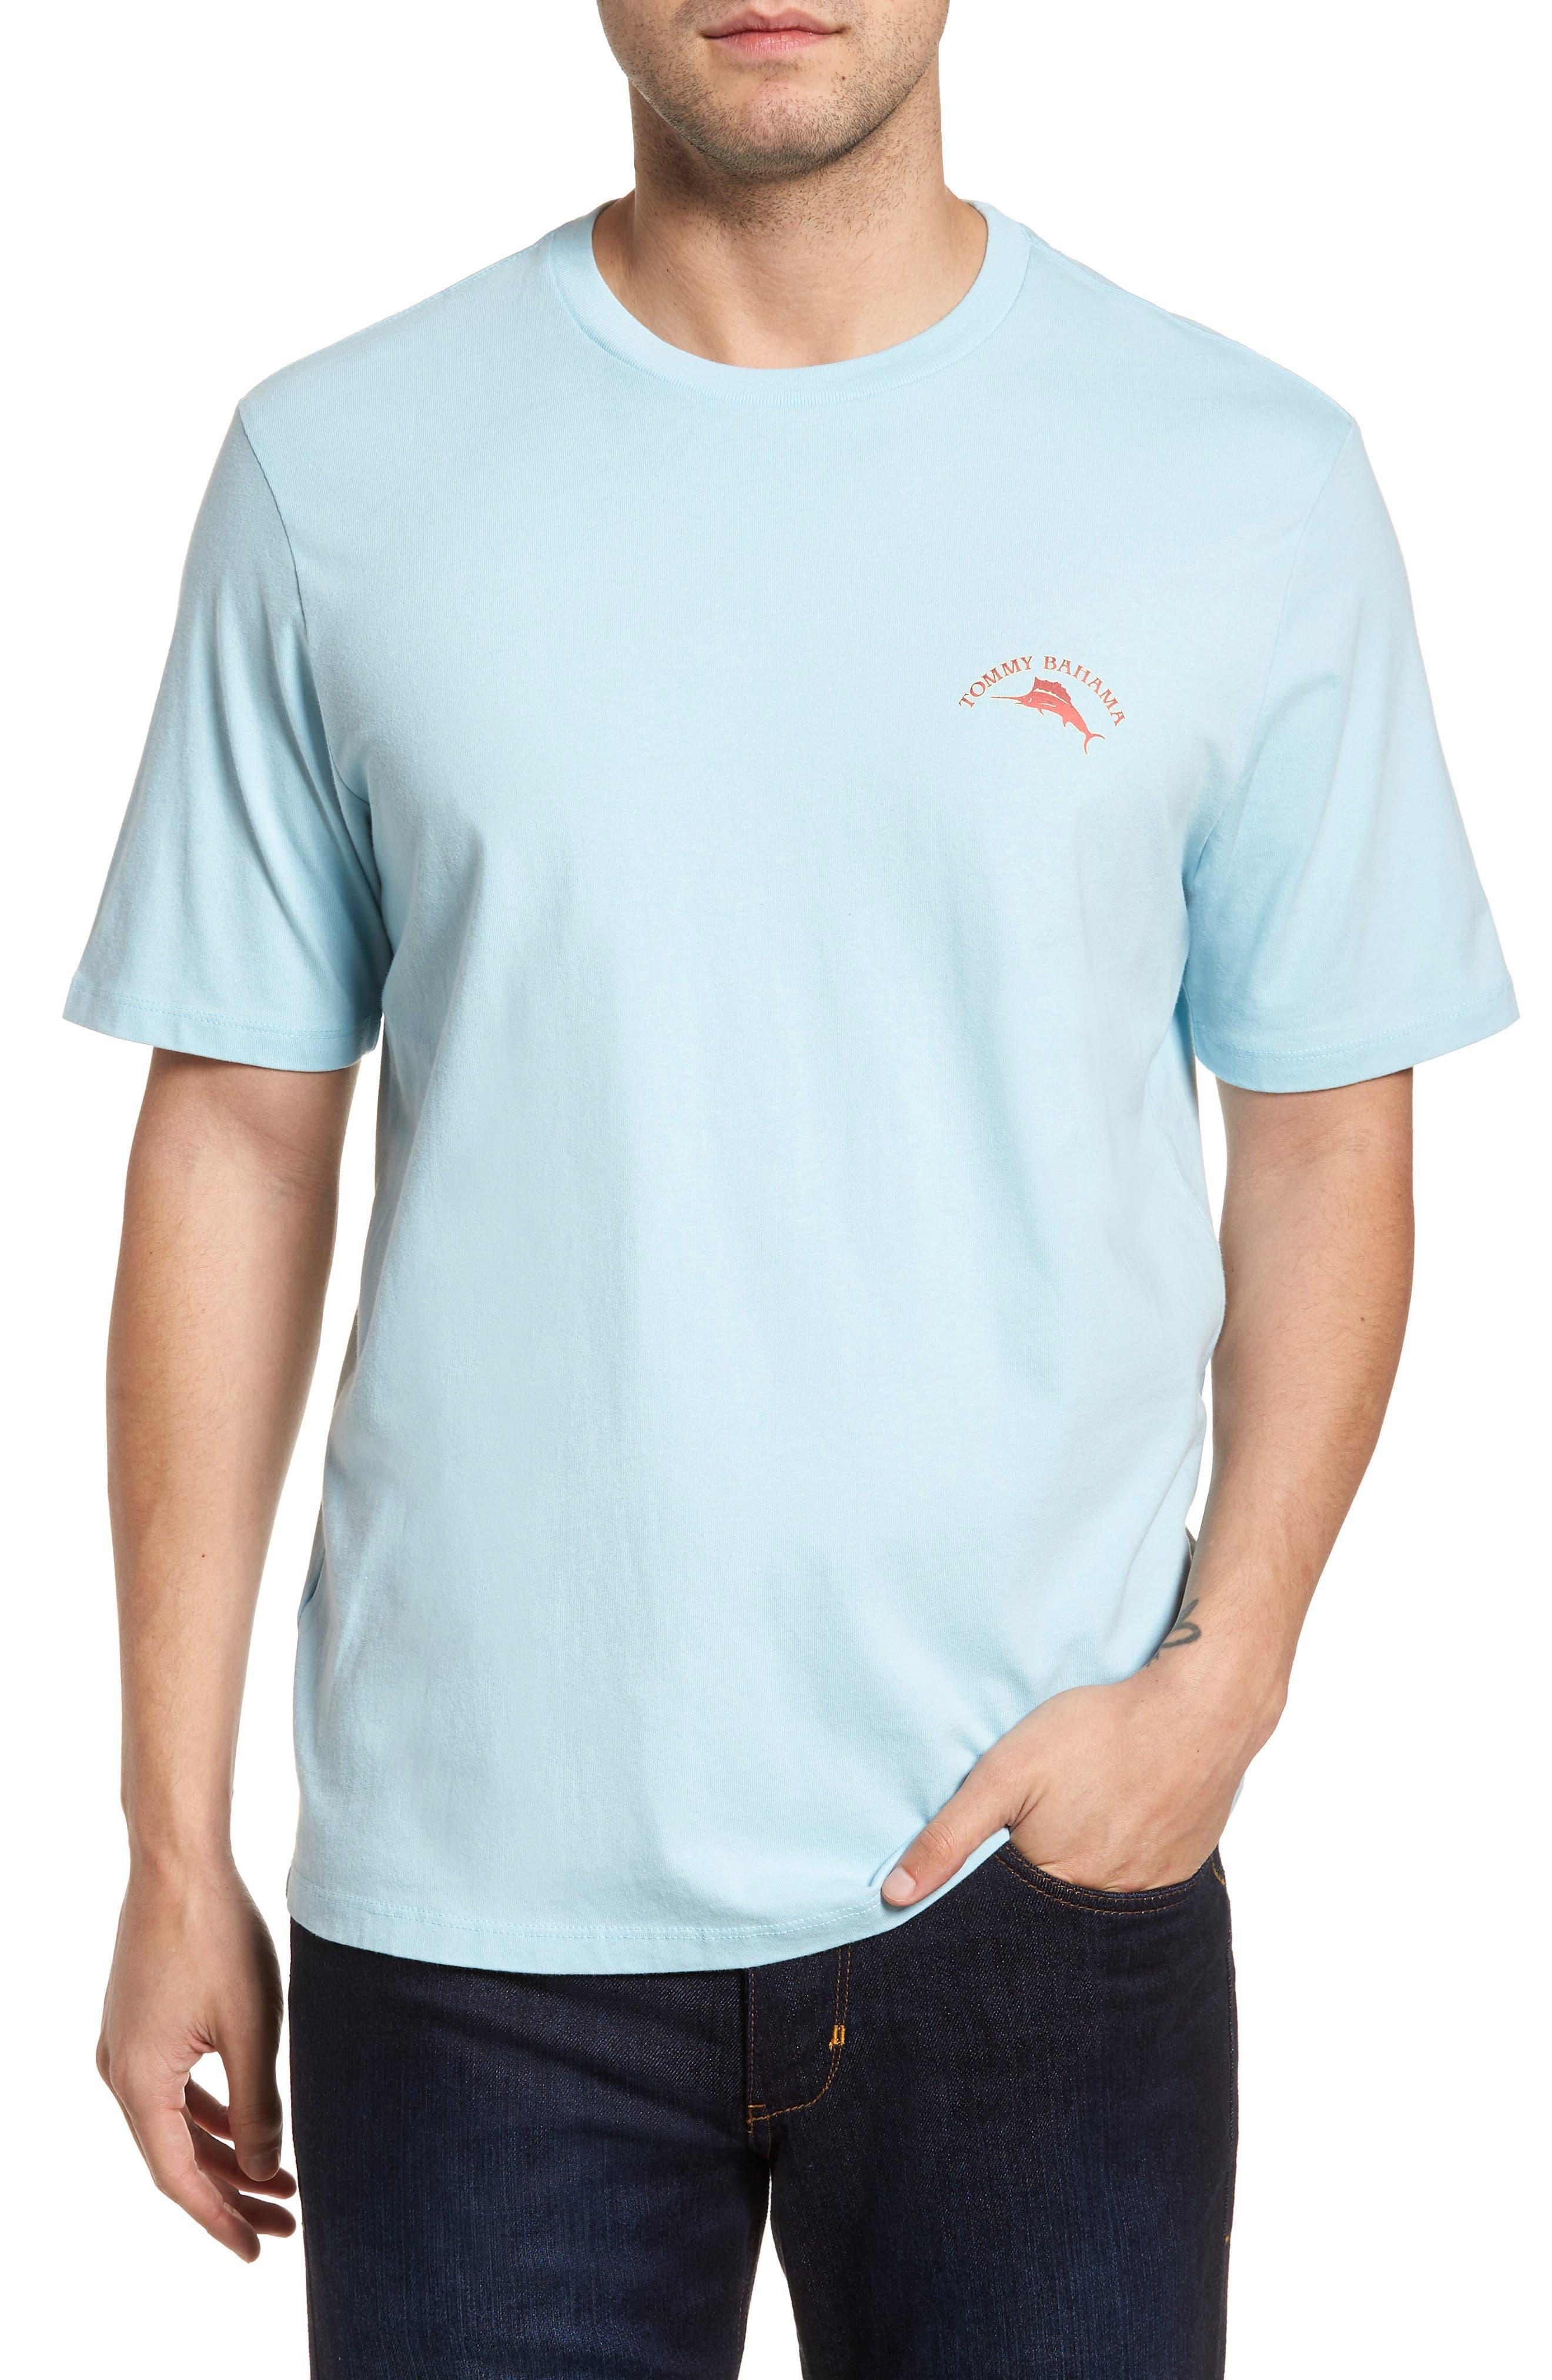 Zinspiration T-Shirt,                             Main thumbnail 1, color,                             Opal